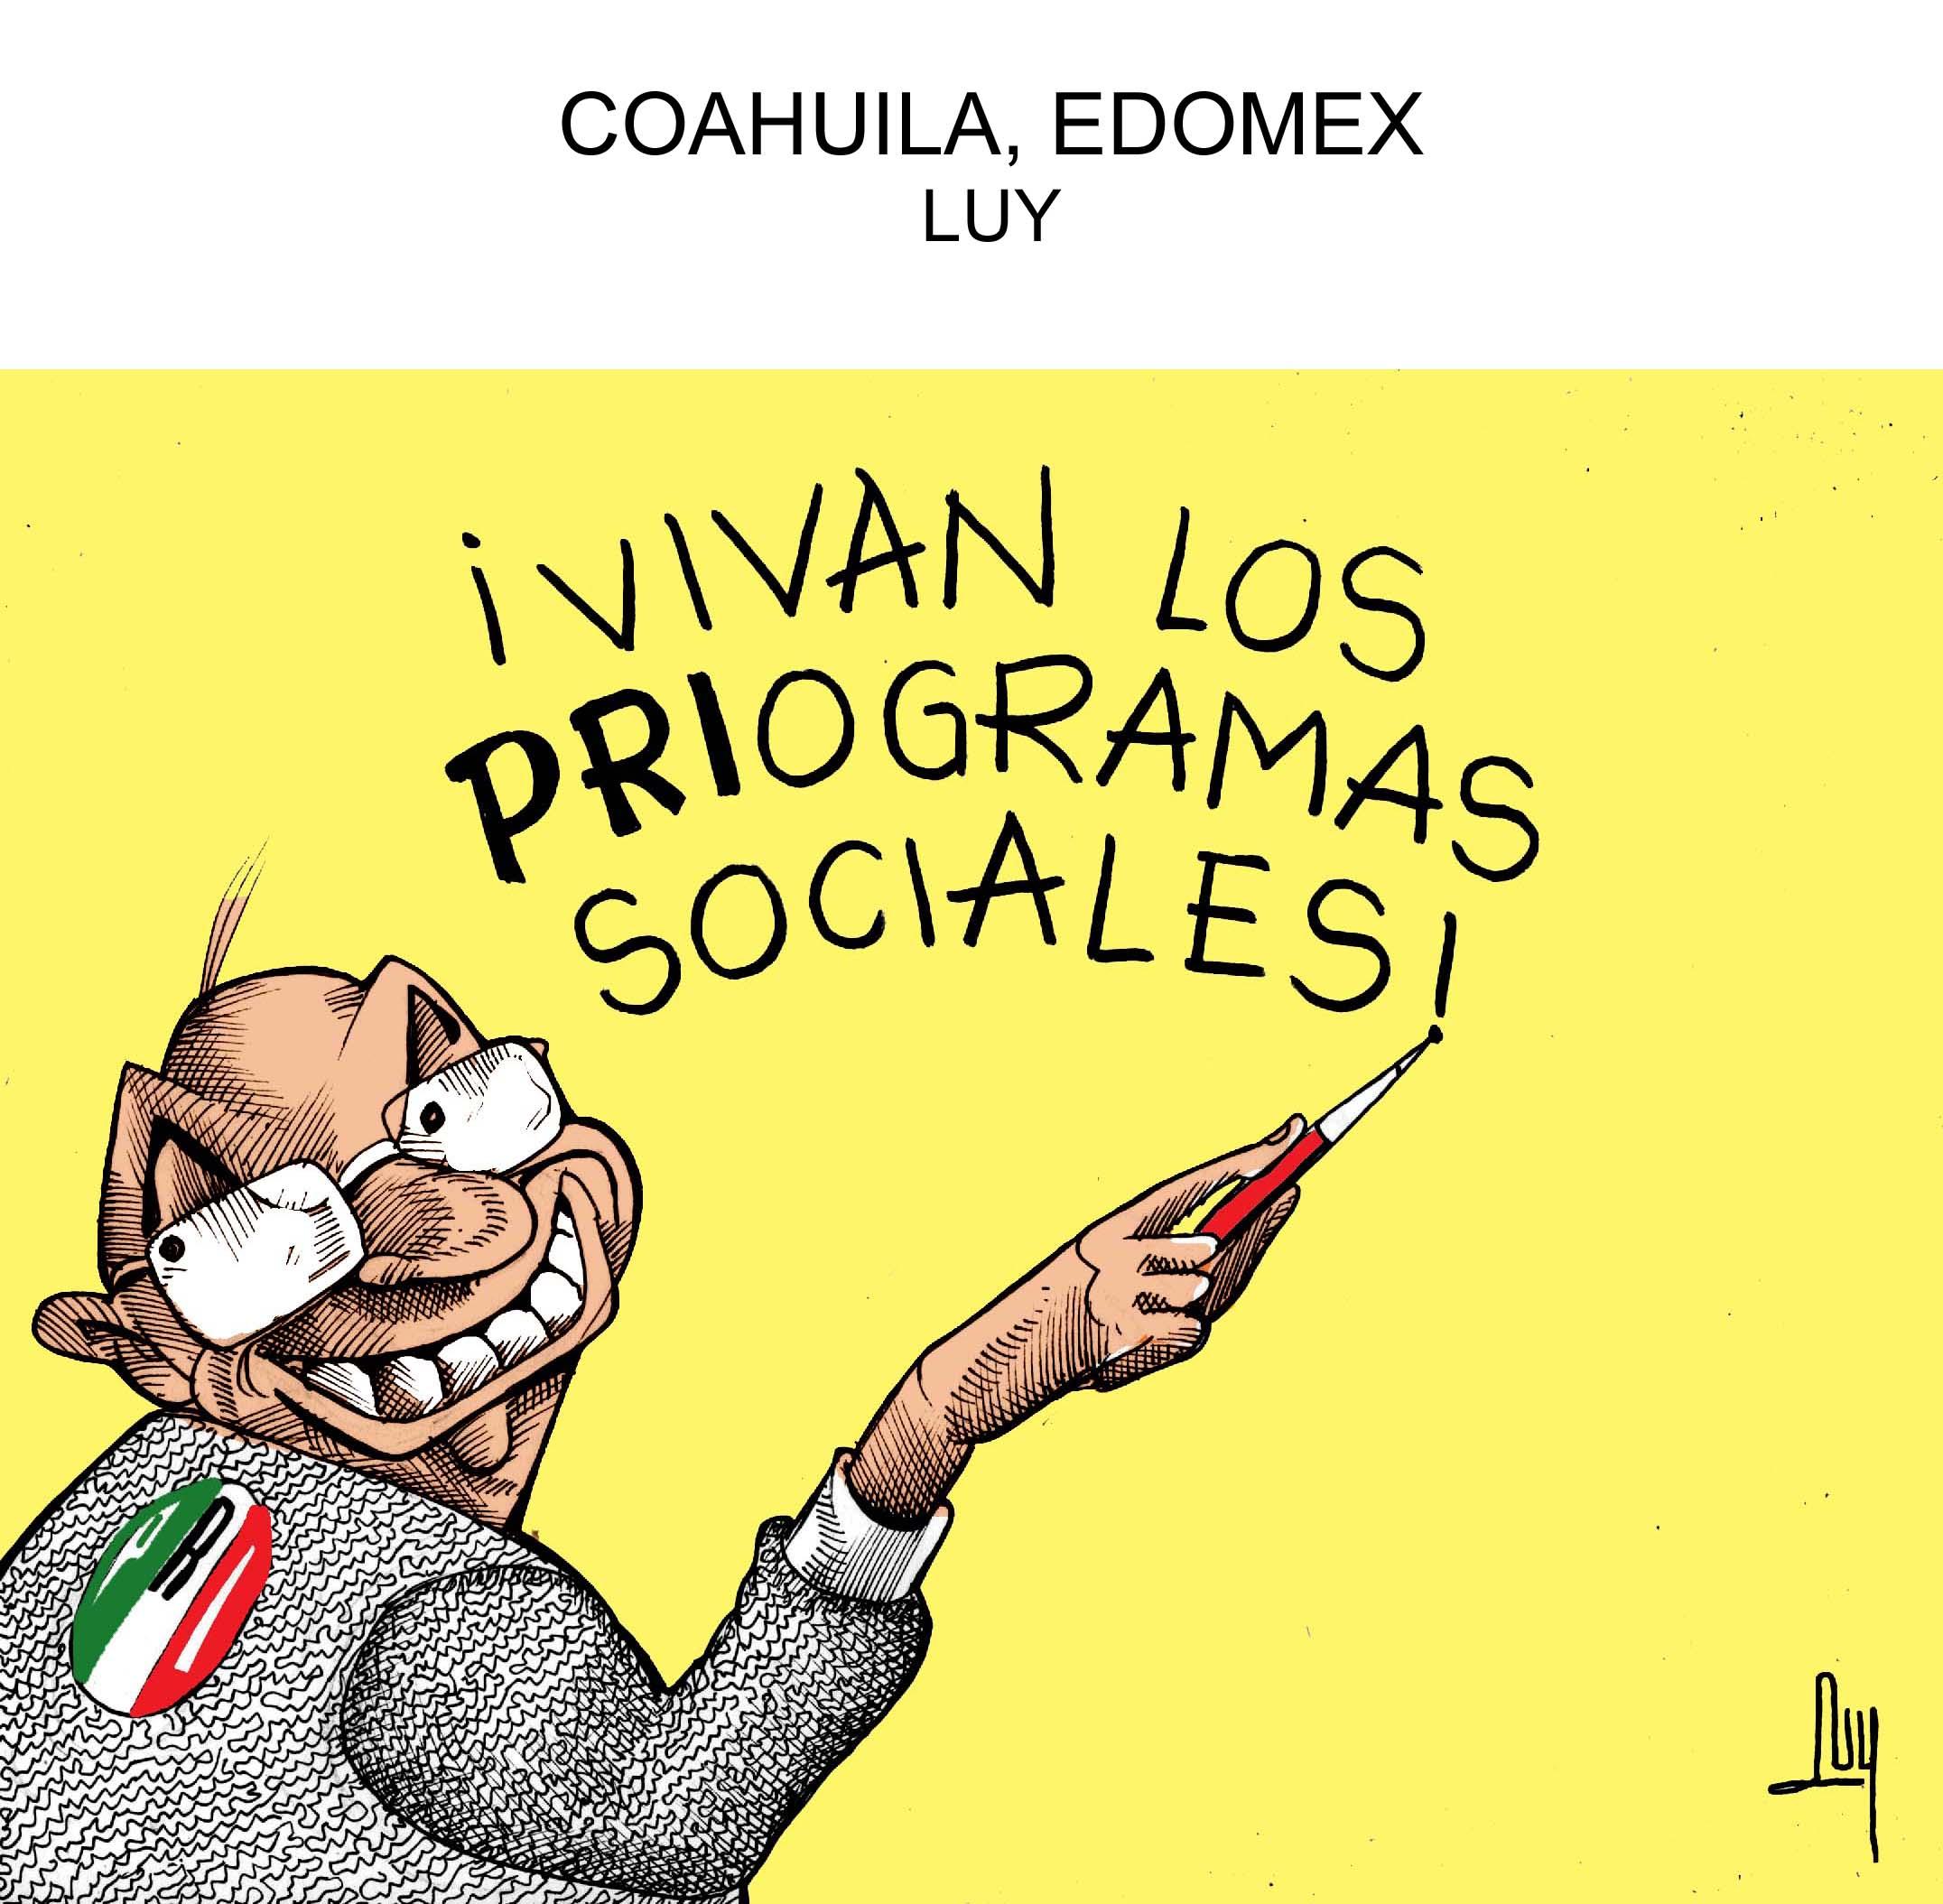 coahuila-edomex